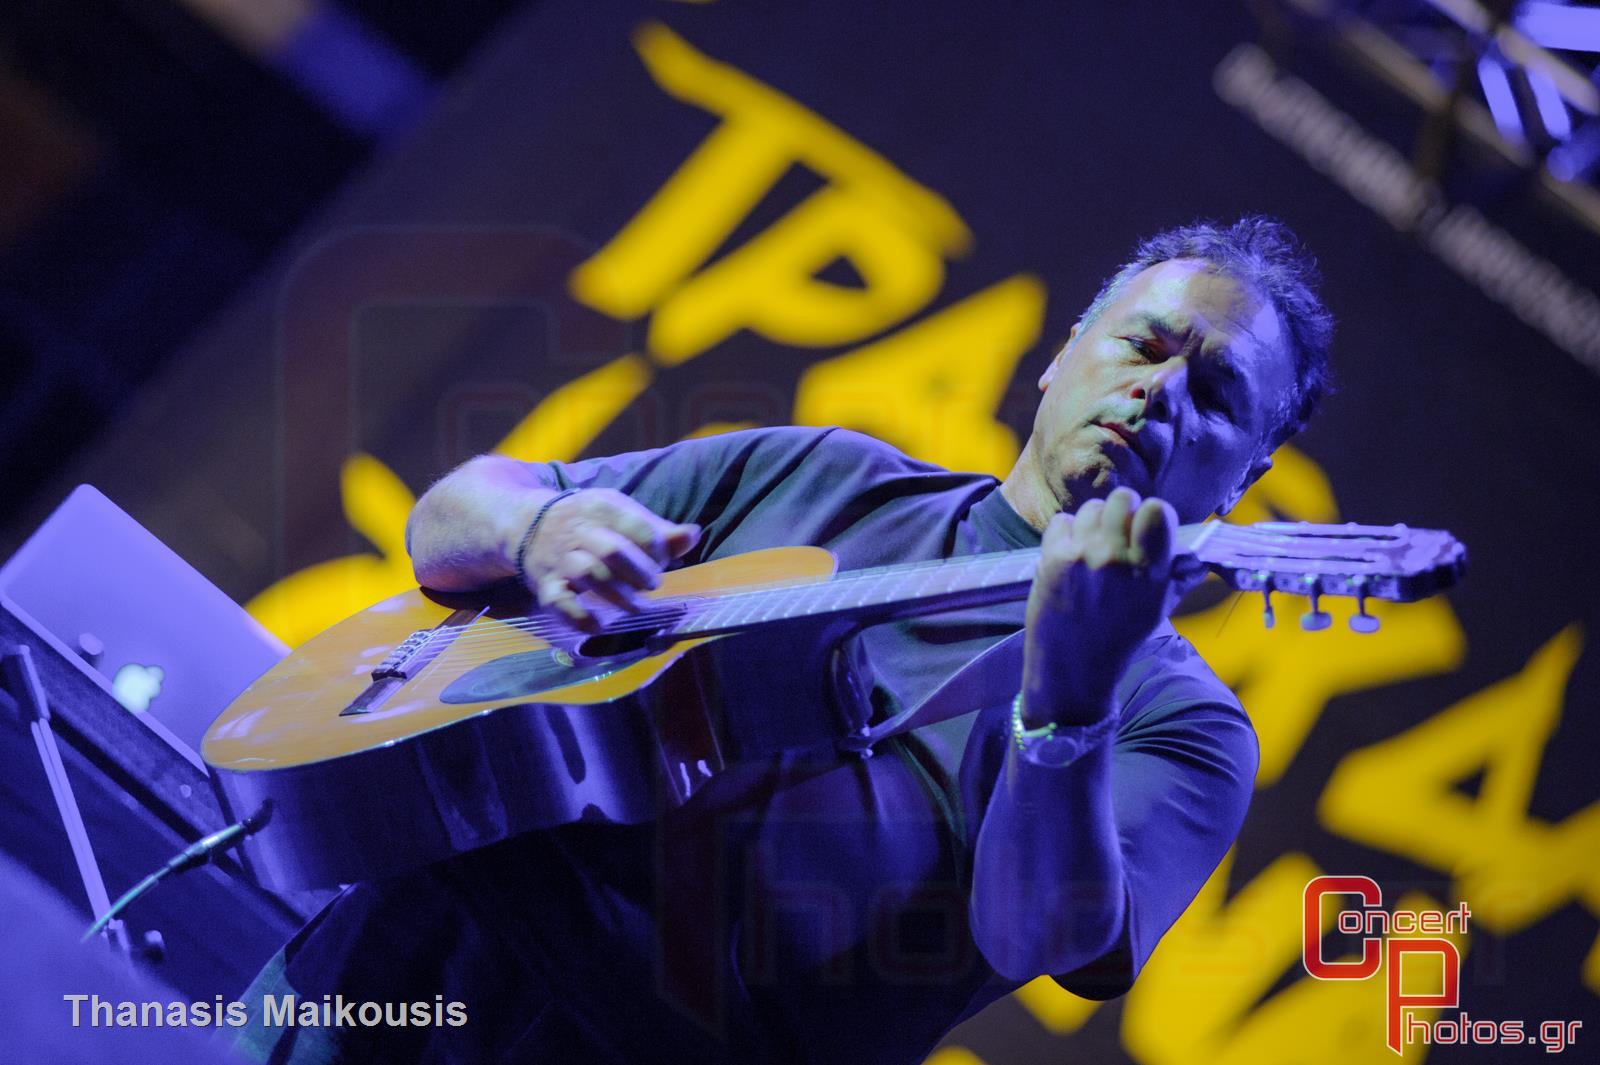 Active Member - Τραγούδα μας να φύγει το σκοτάδι- photographer: Thanasis Maikousis - concertphotos_-5944